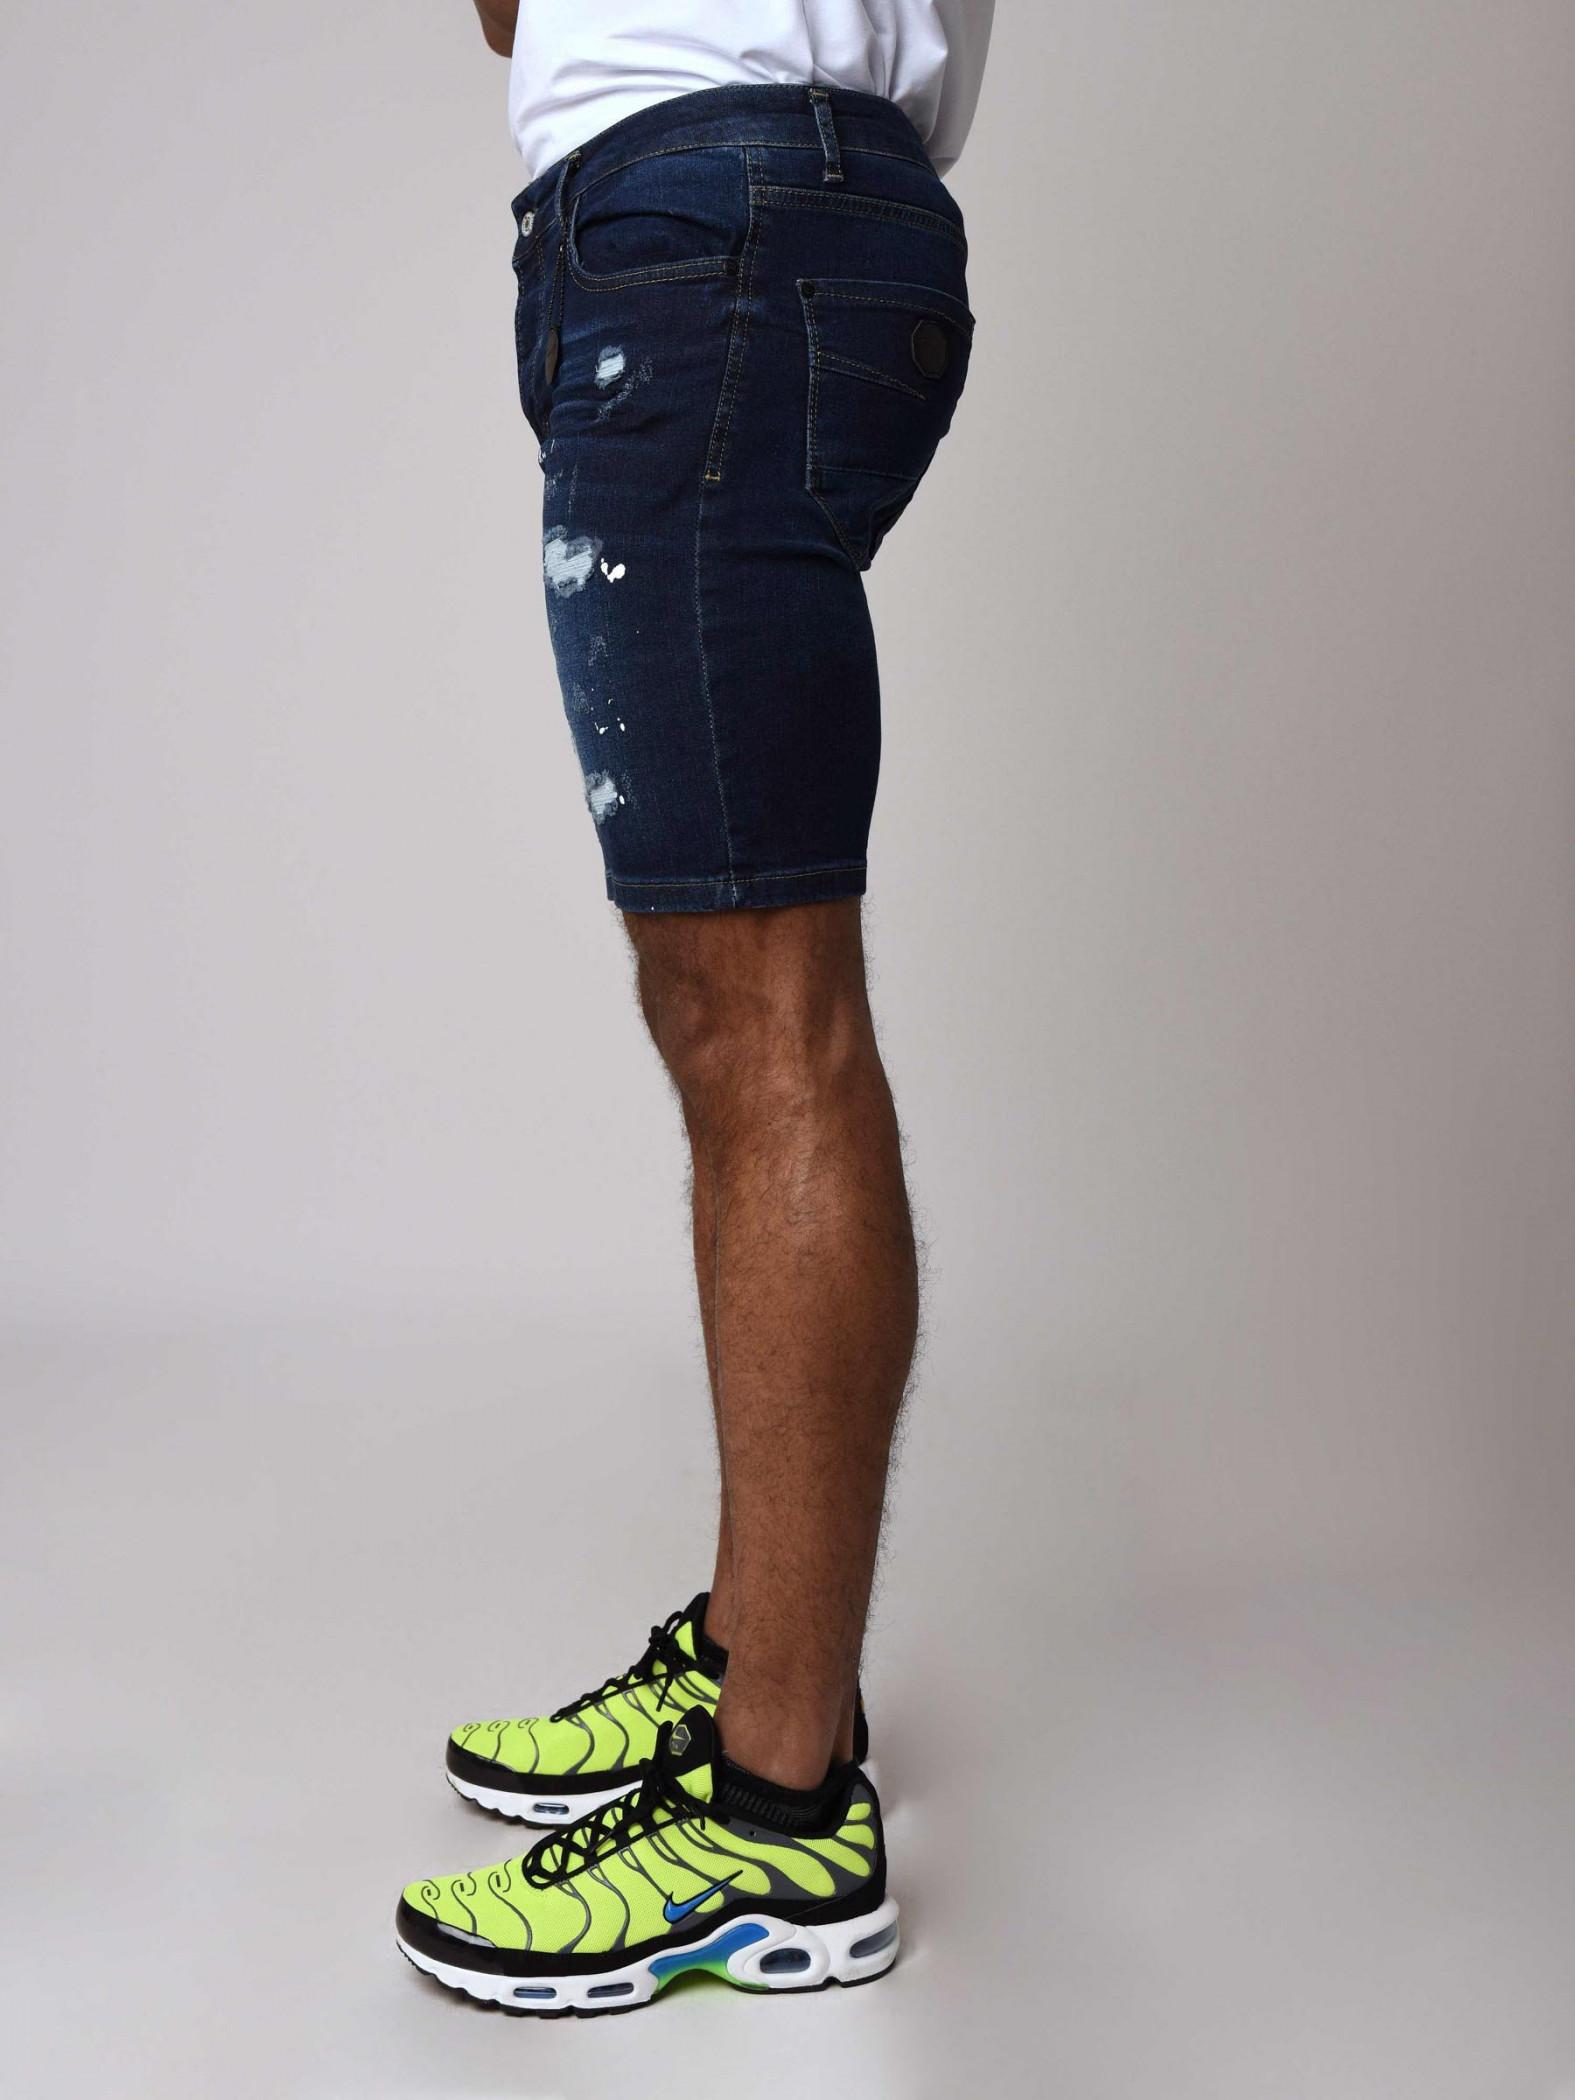 004bbb06c5e1 Men's Skinny Denim Shorts with Rips and Paint Splatter in Navy Blue ...